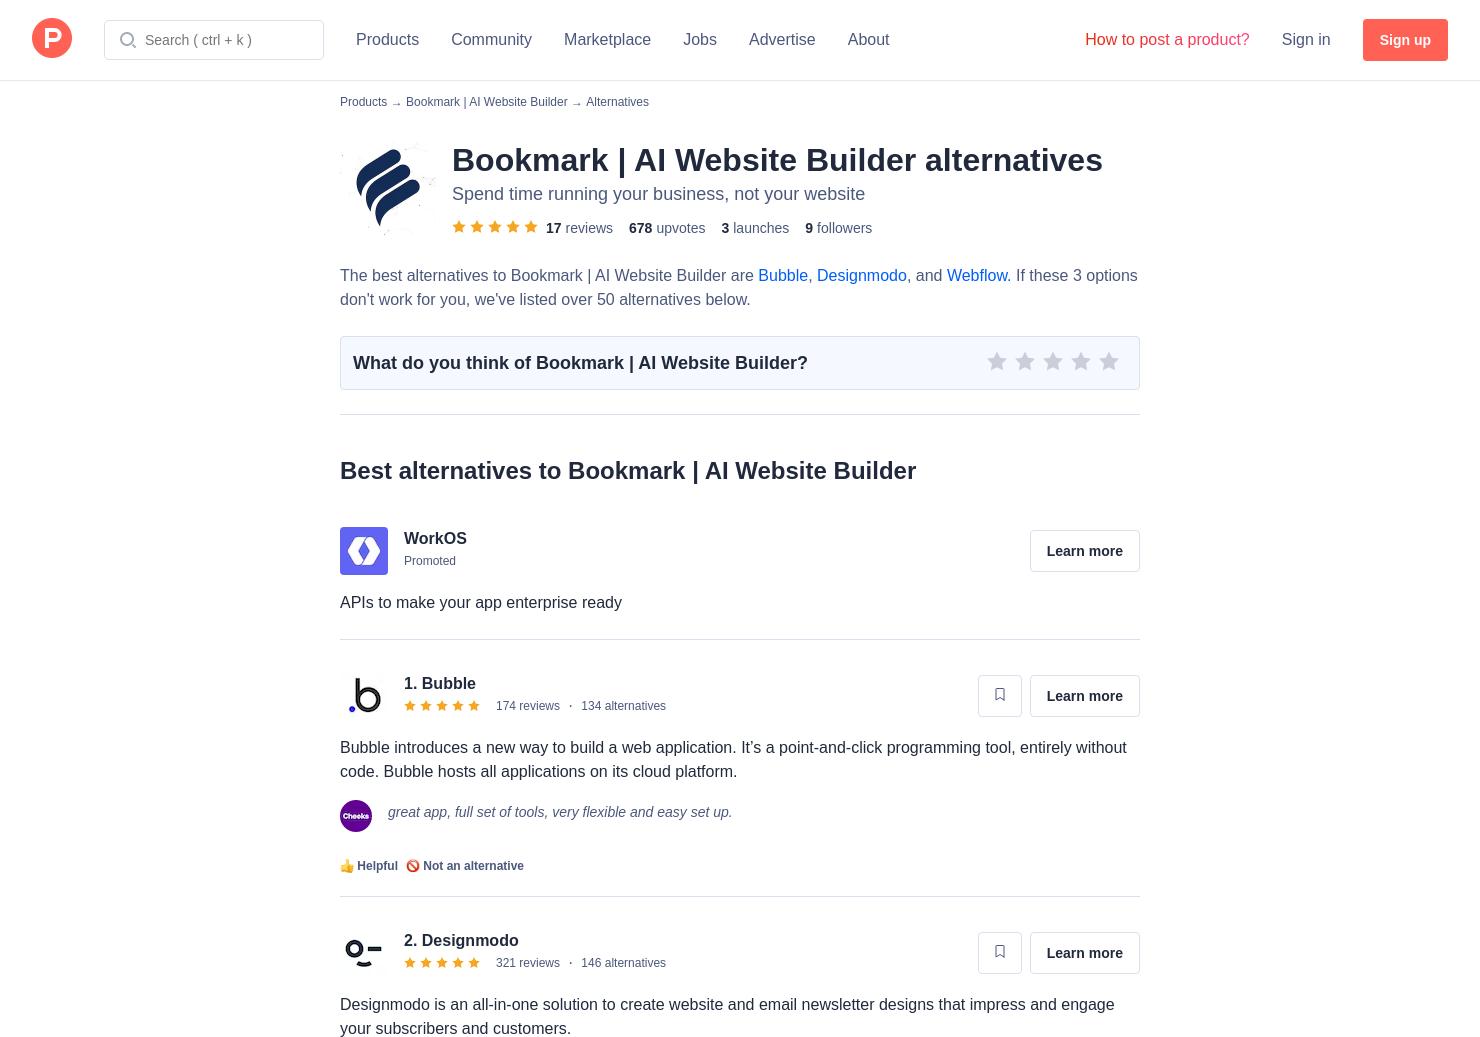 12 Alternatives to Bookmark Website Builder | Product Hunt